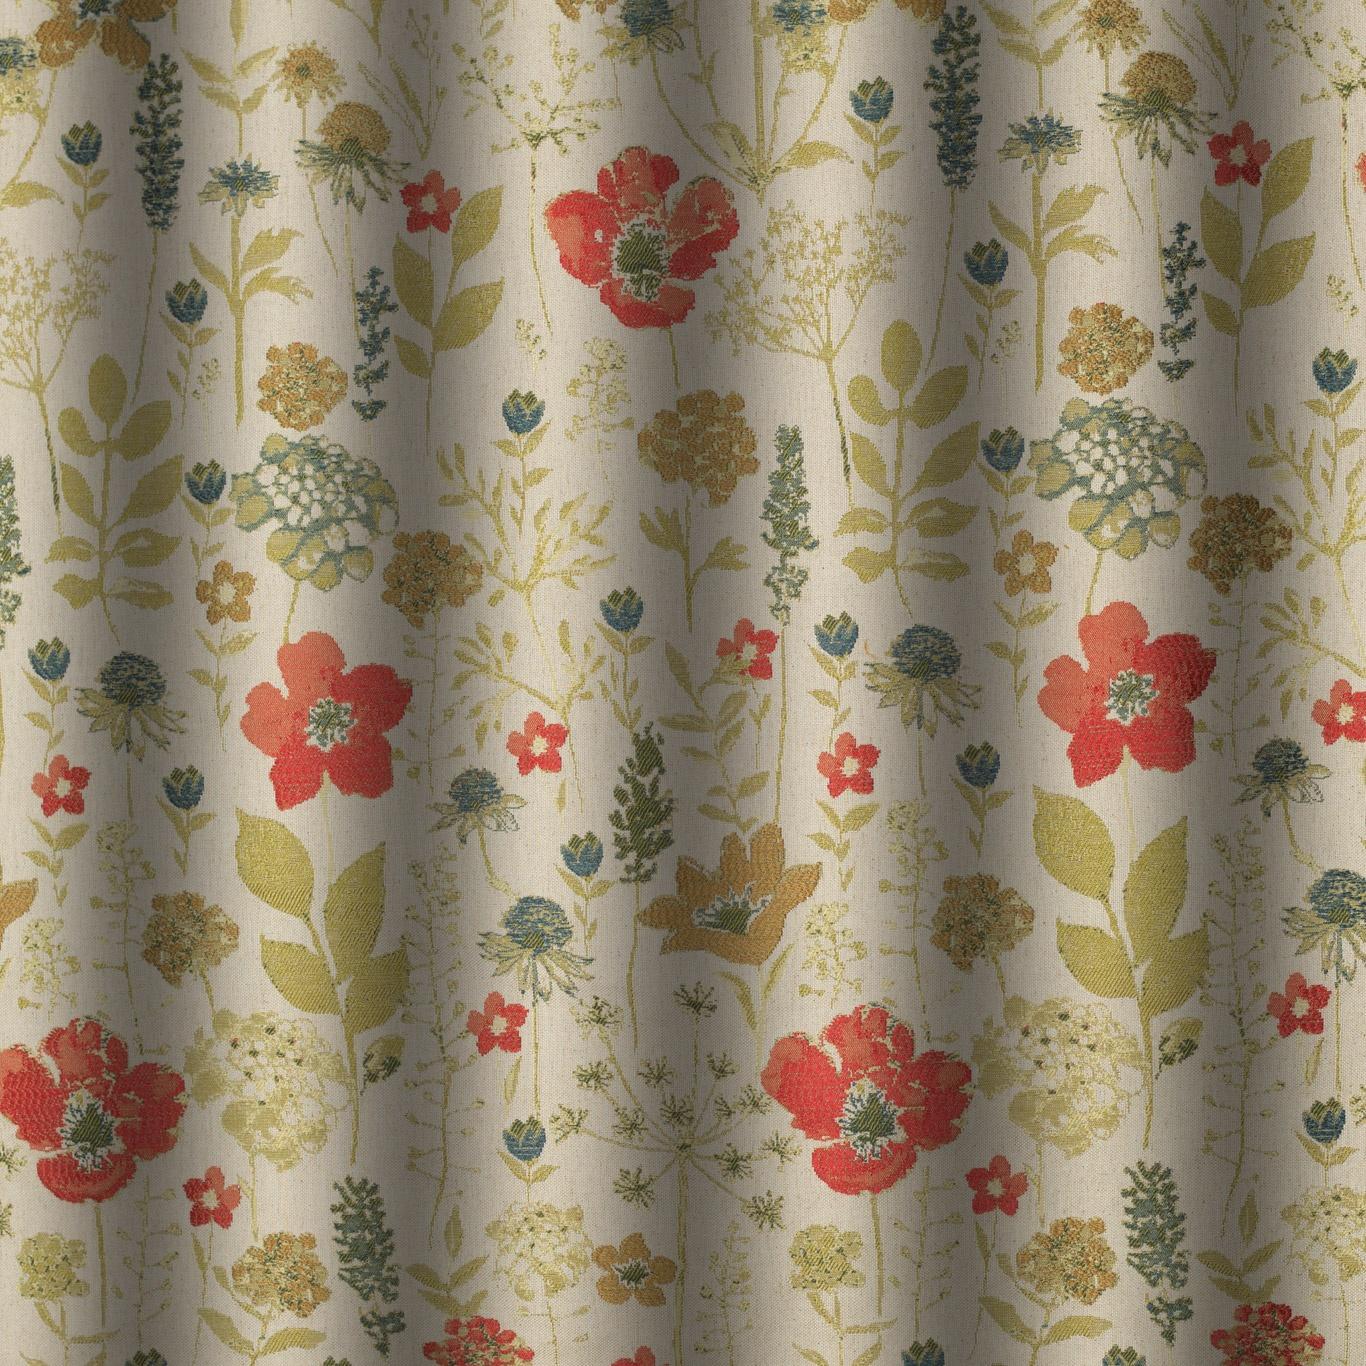 Gordon Smith (Malvern) Ltd. - Chess Designs Meadow Poppy Curtain ...